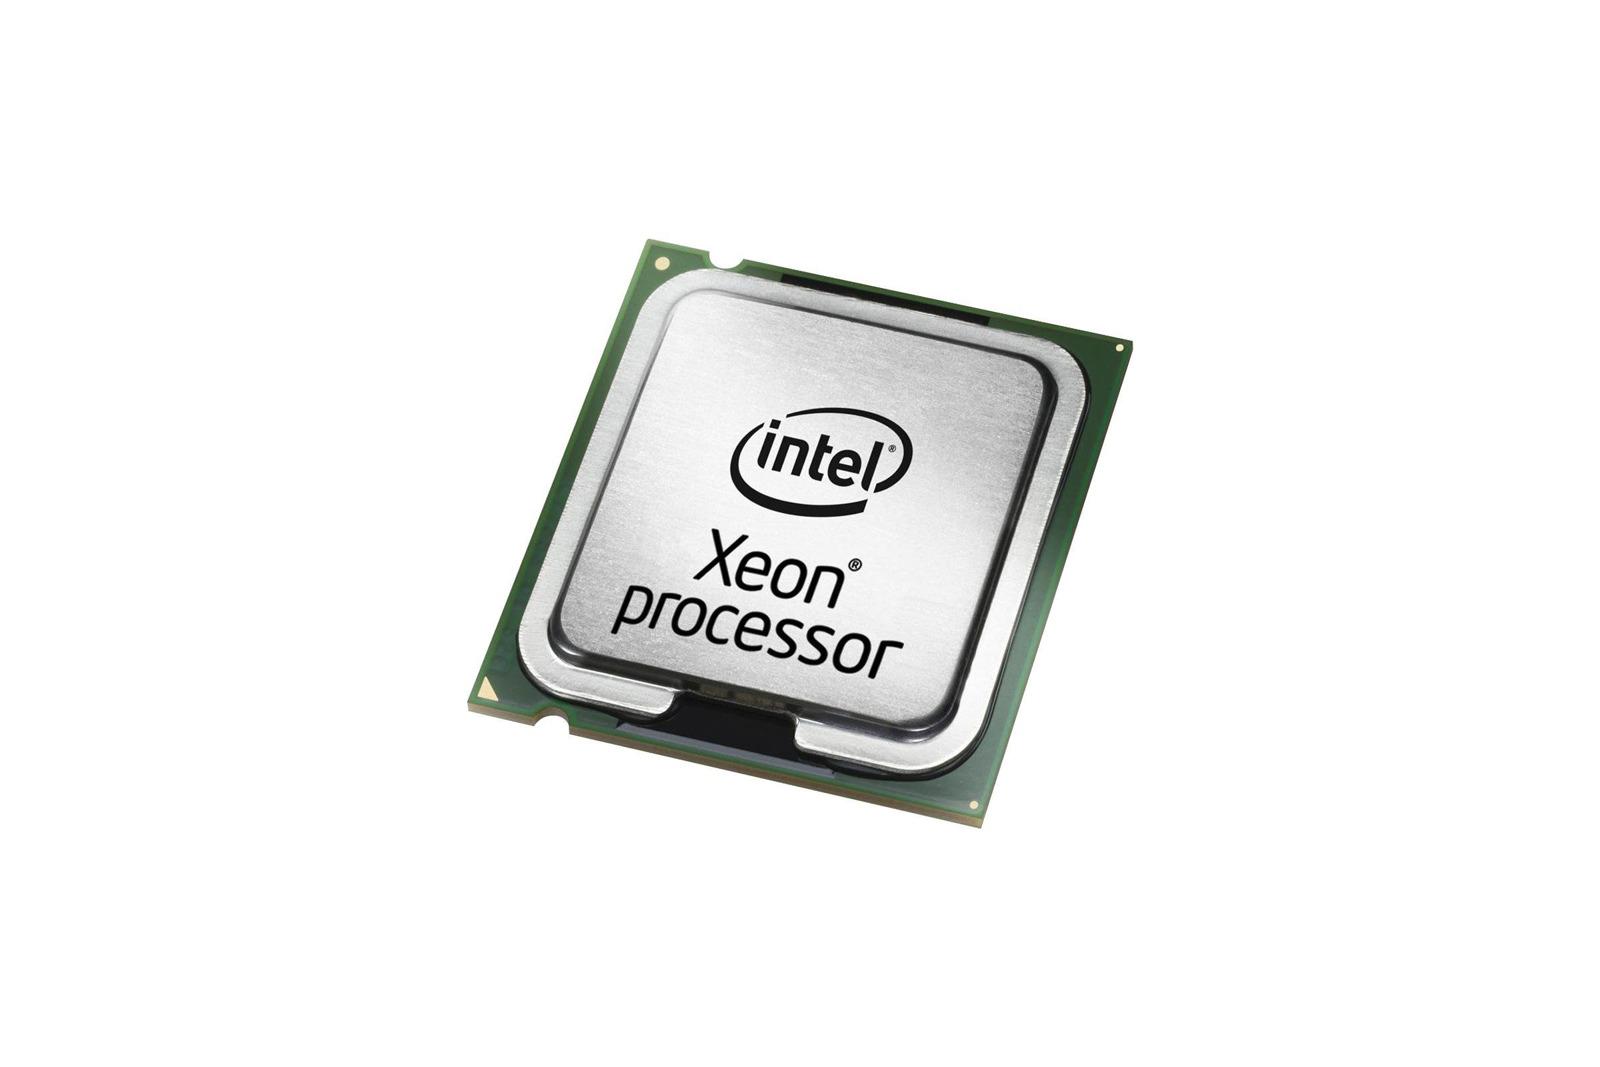 Processor Intel Xeon E5640 2.66GHz 12MB FCLGA1366